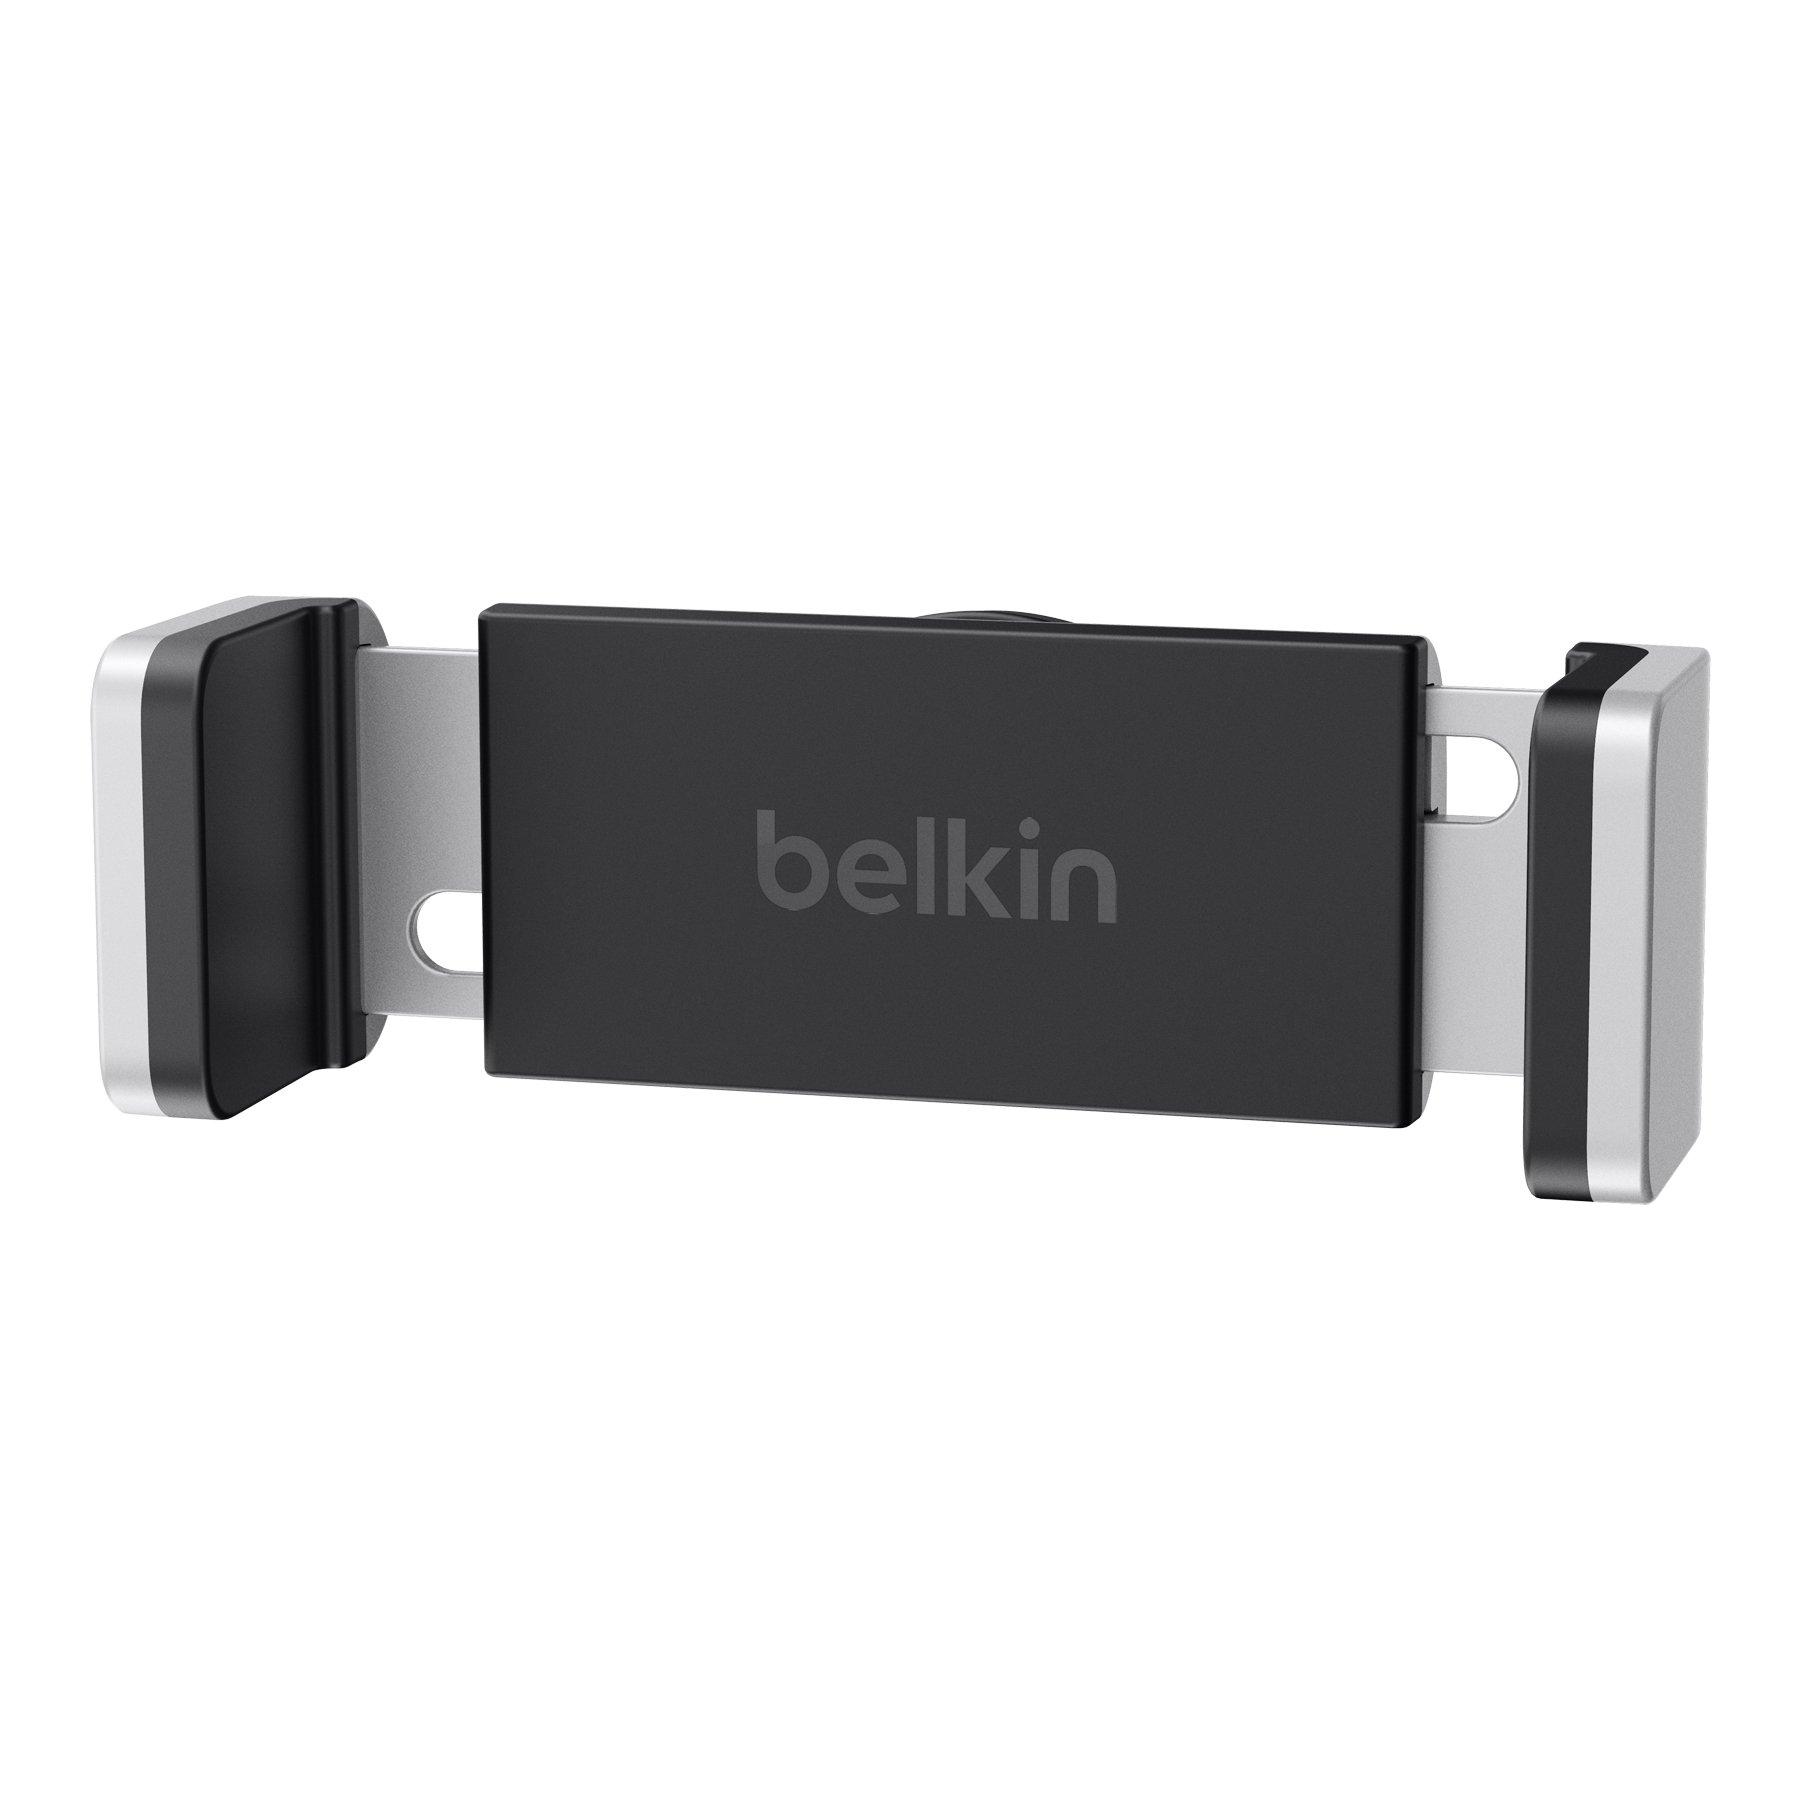 Belkin Car Vent Mount for Smartphones, Including All Samsung S Series and Apple iPhones (Older Model)